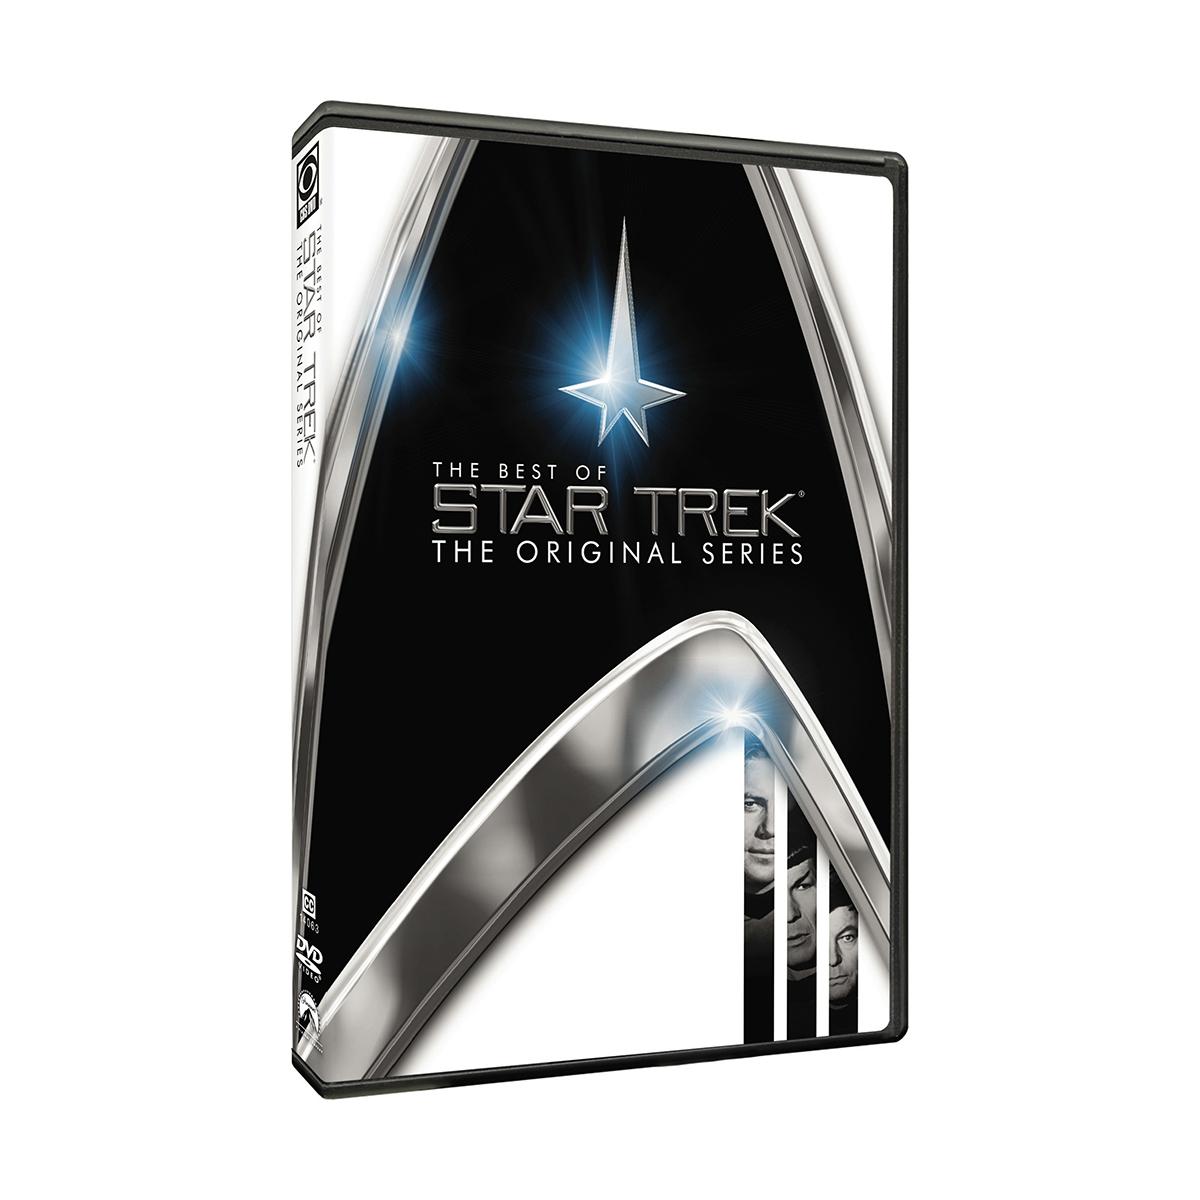 The Best Of Star Trek: The Original Series DVD